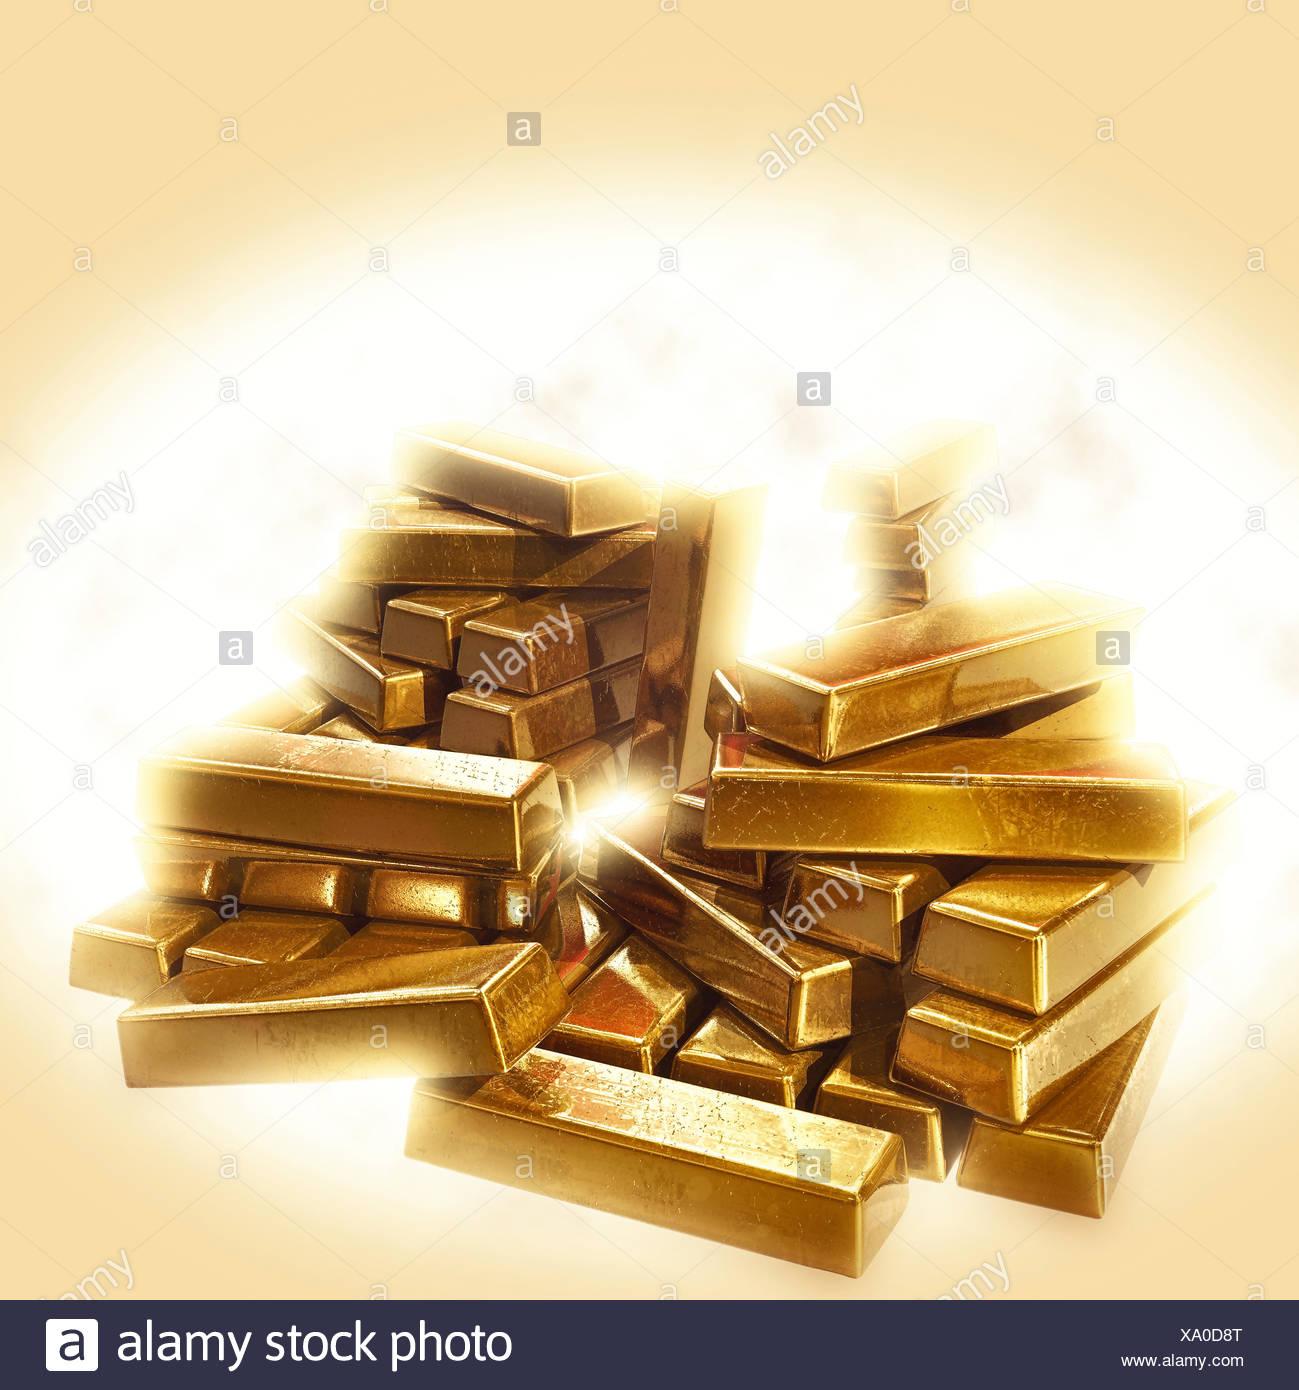 A stack of shining gold bullion - Stock Image